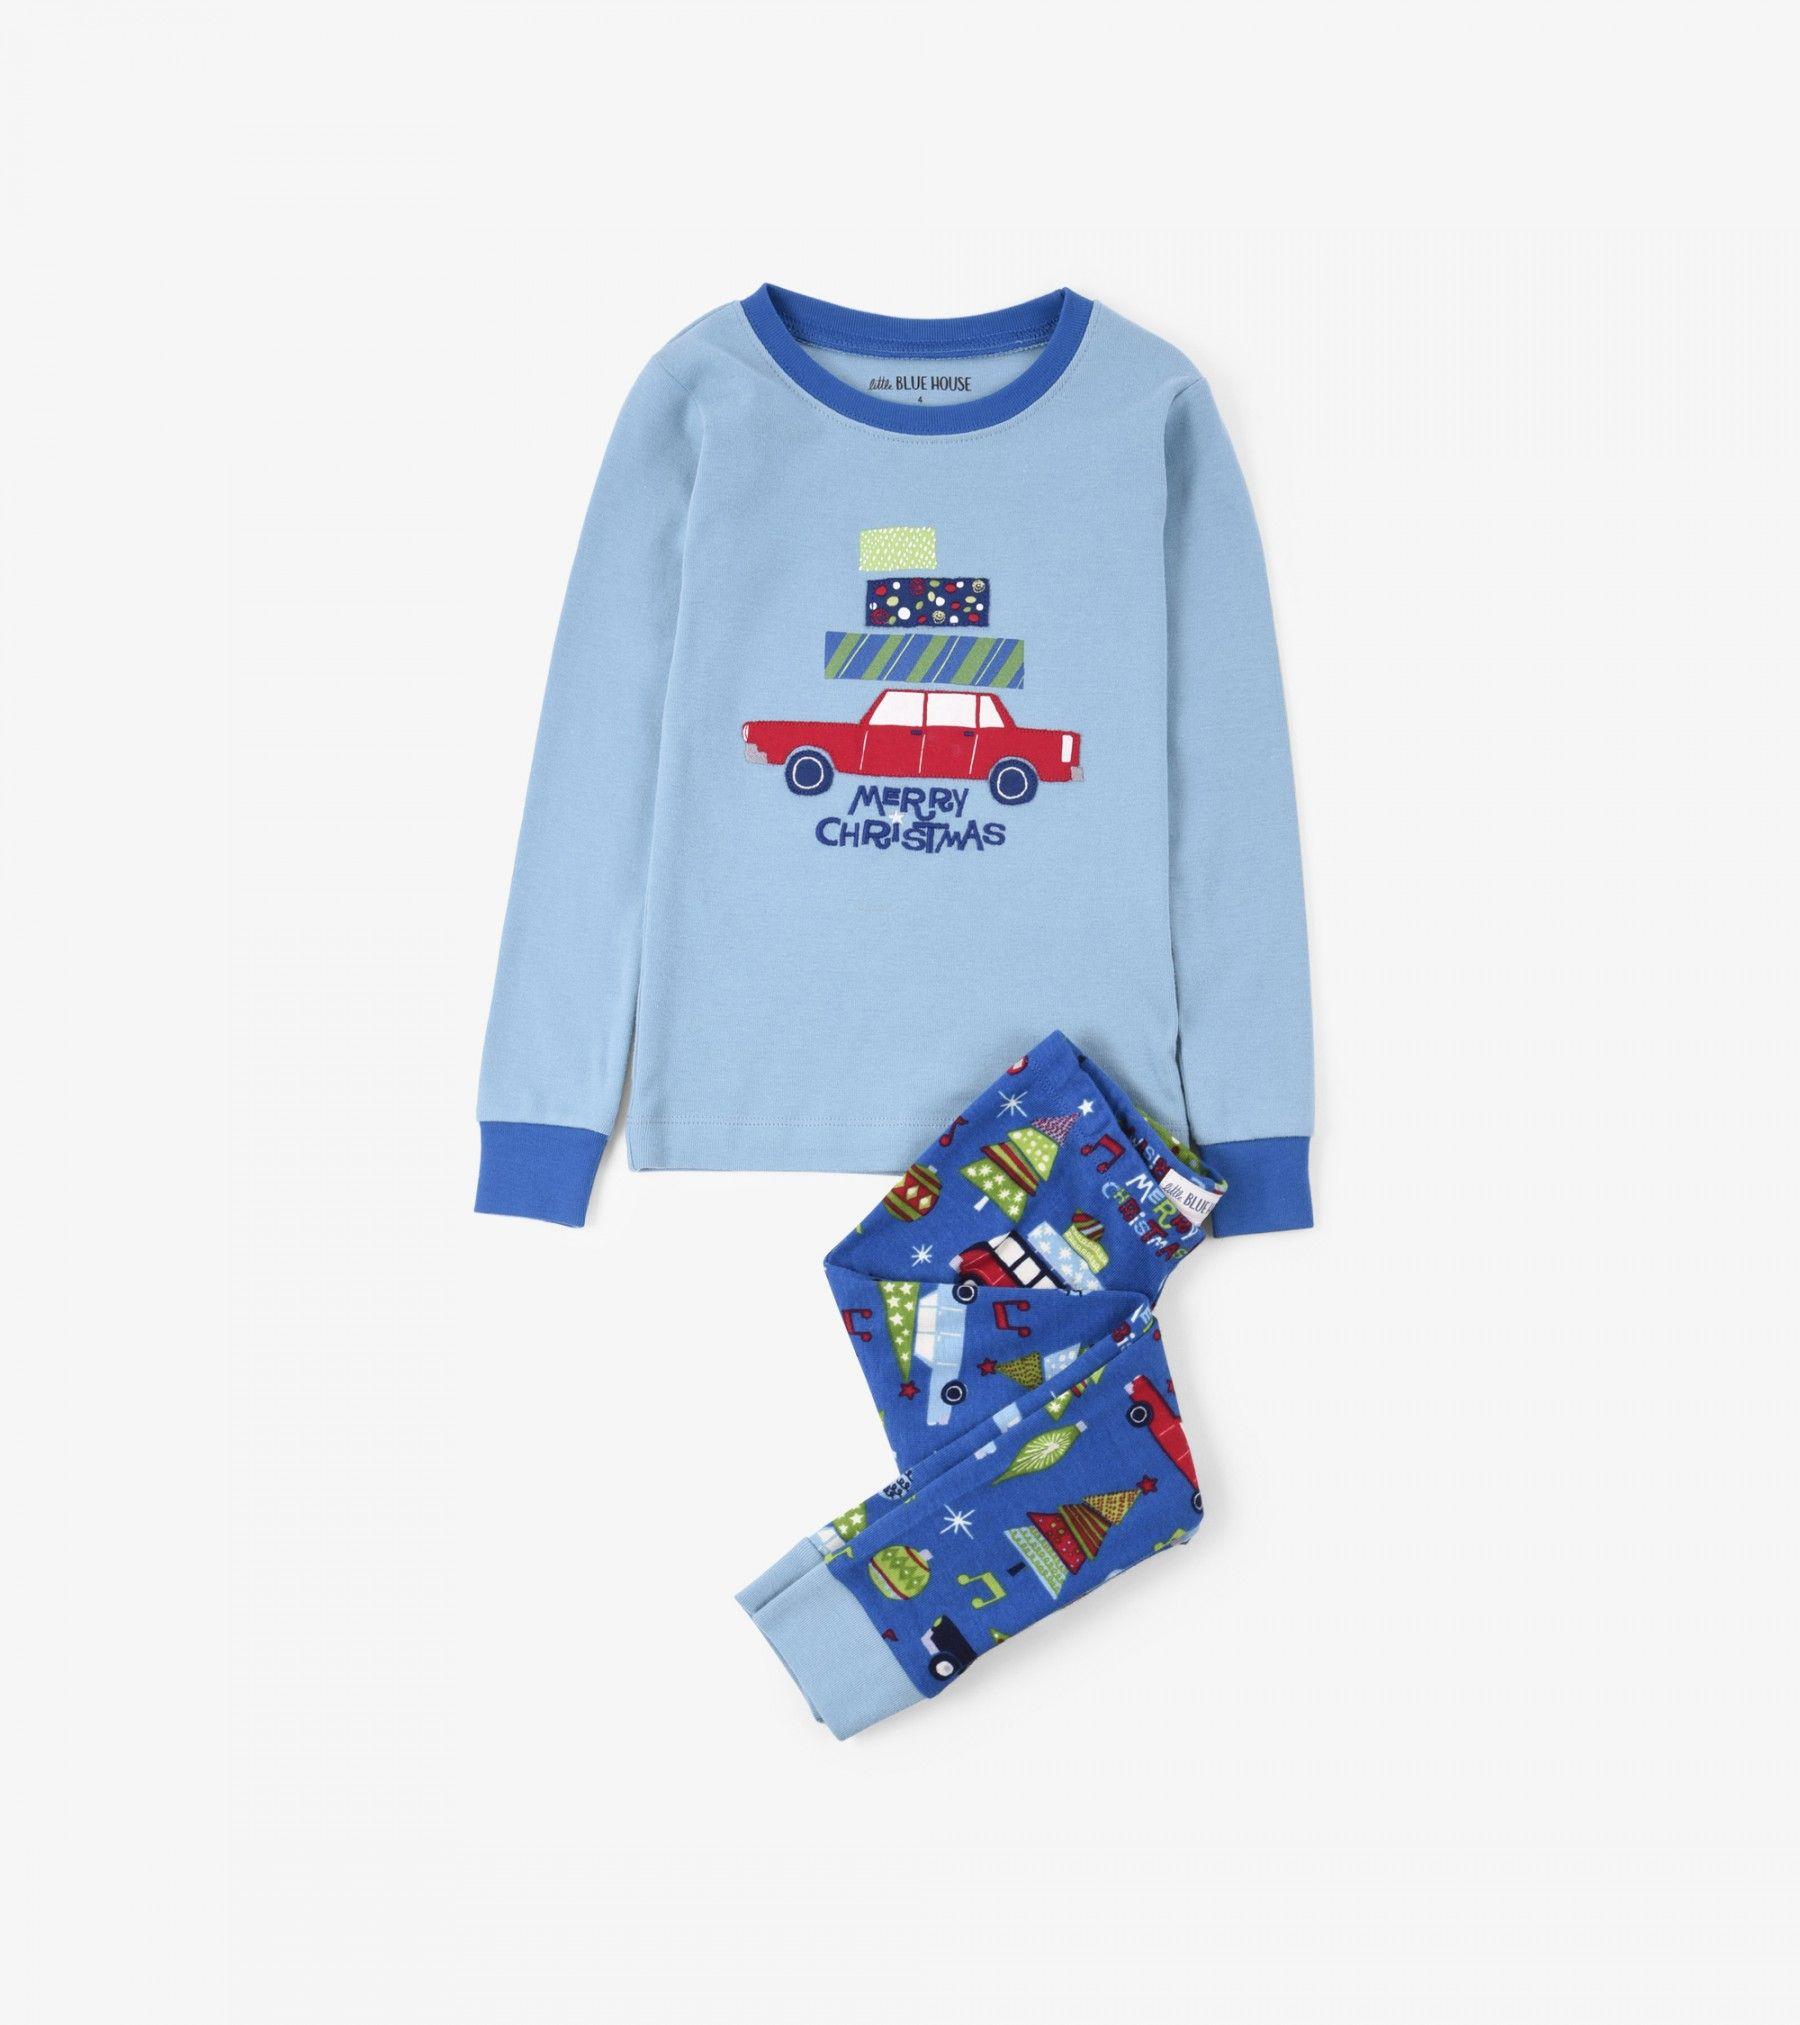 Retro Festive Blue Kids Pajama Set Little Blue House By Hatley Canada Pajama Set Retro